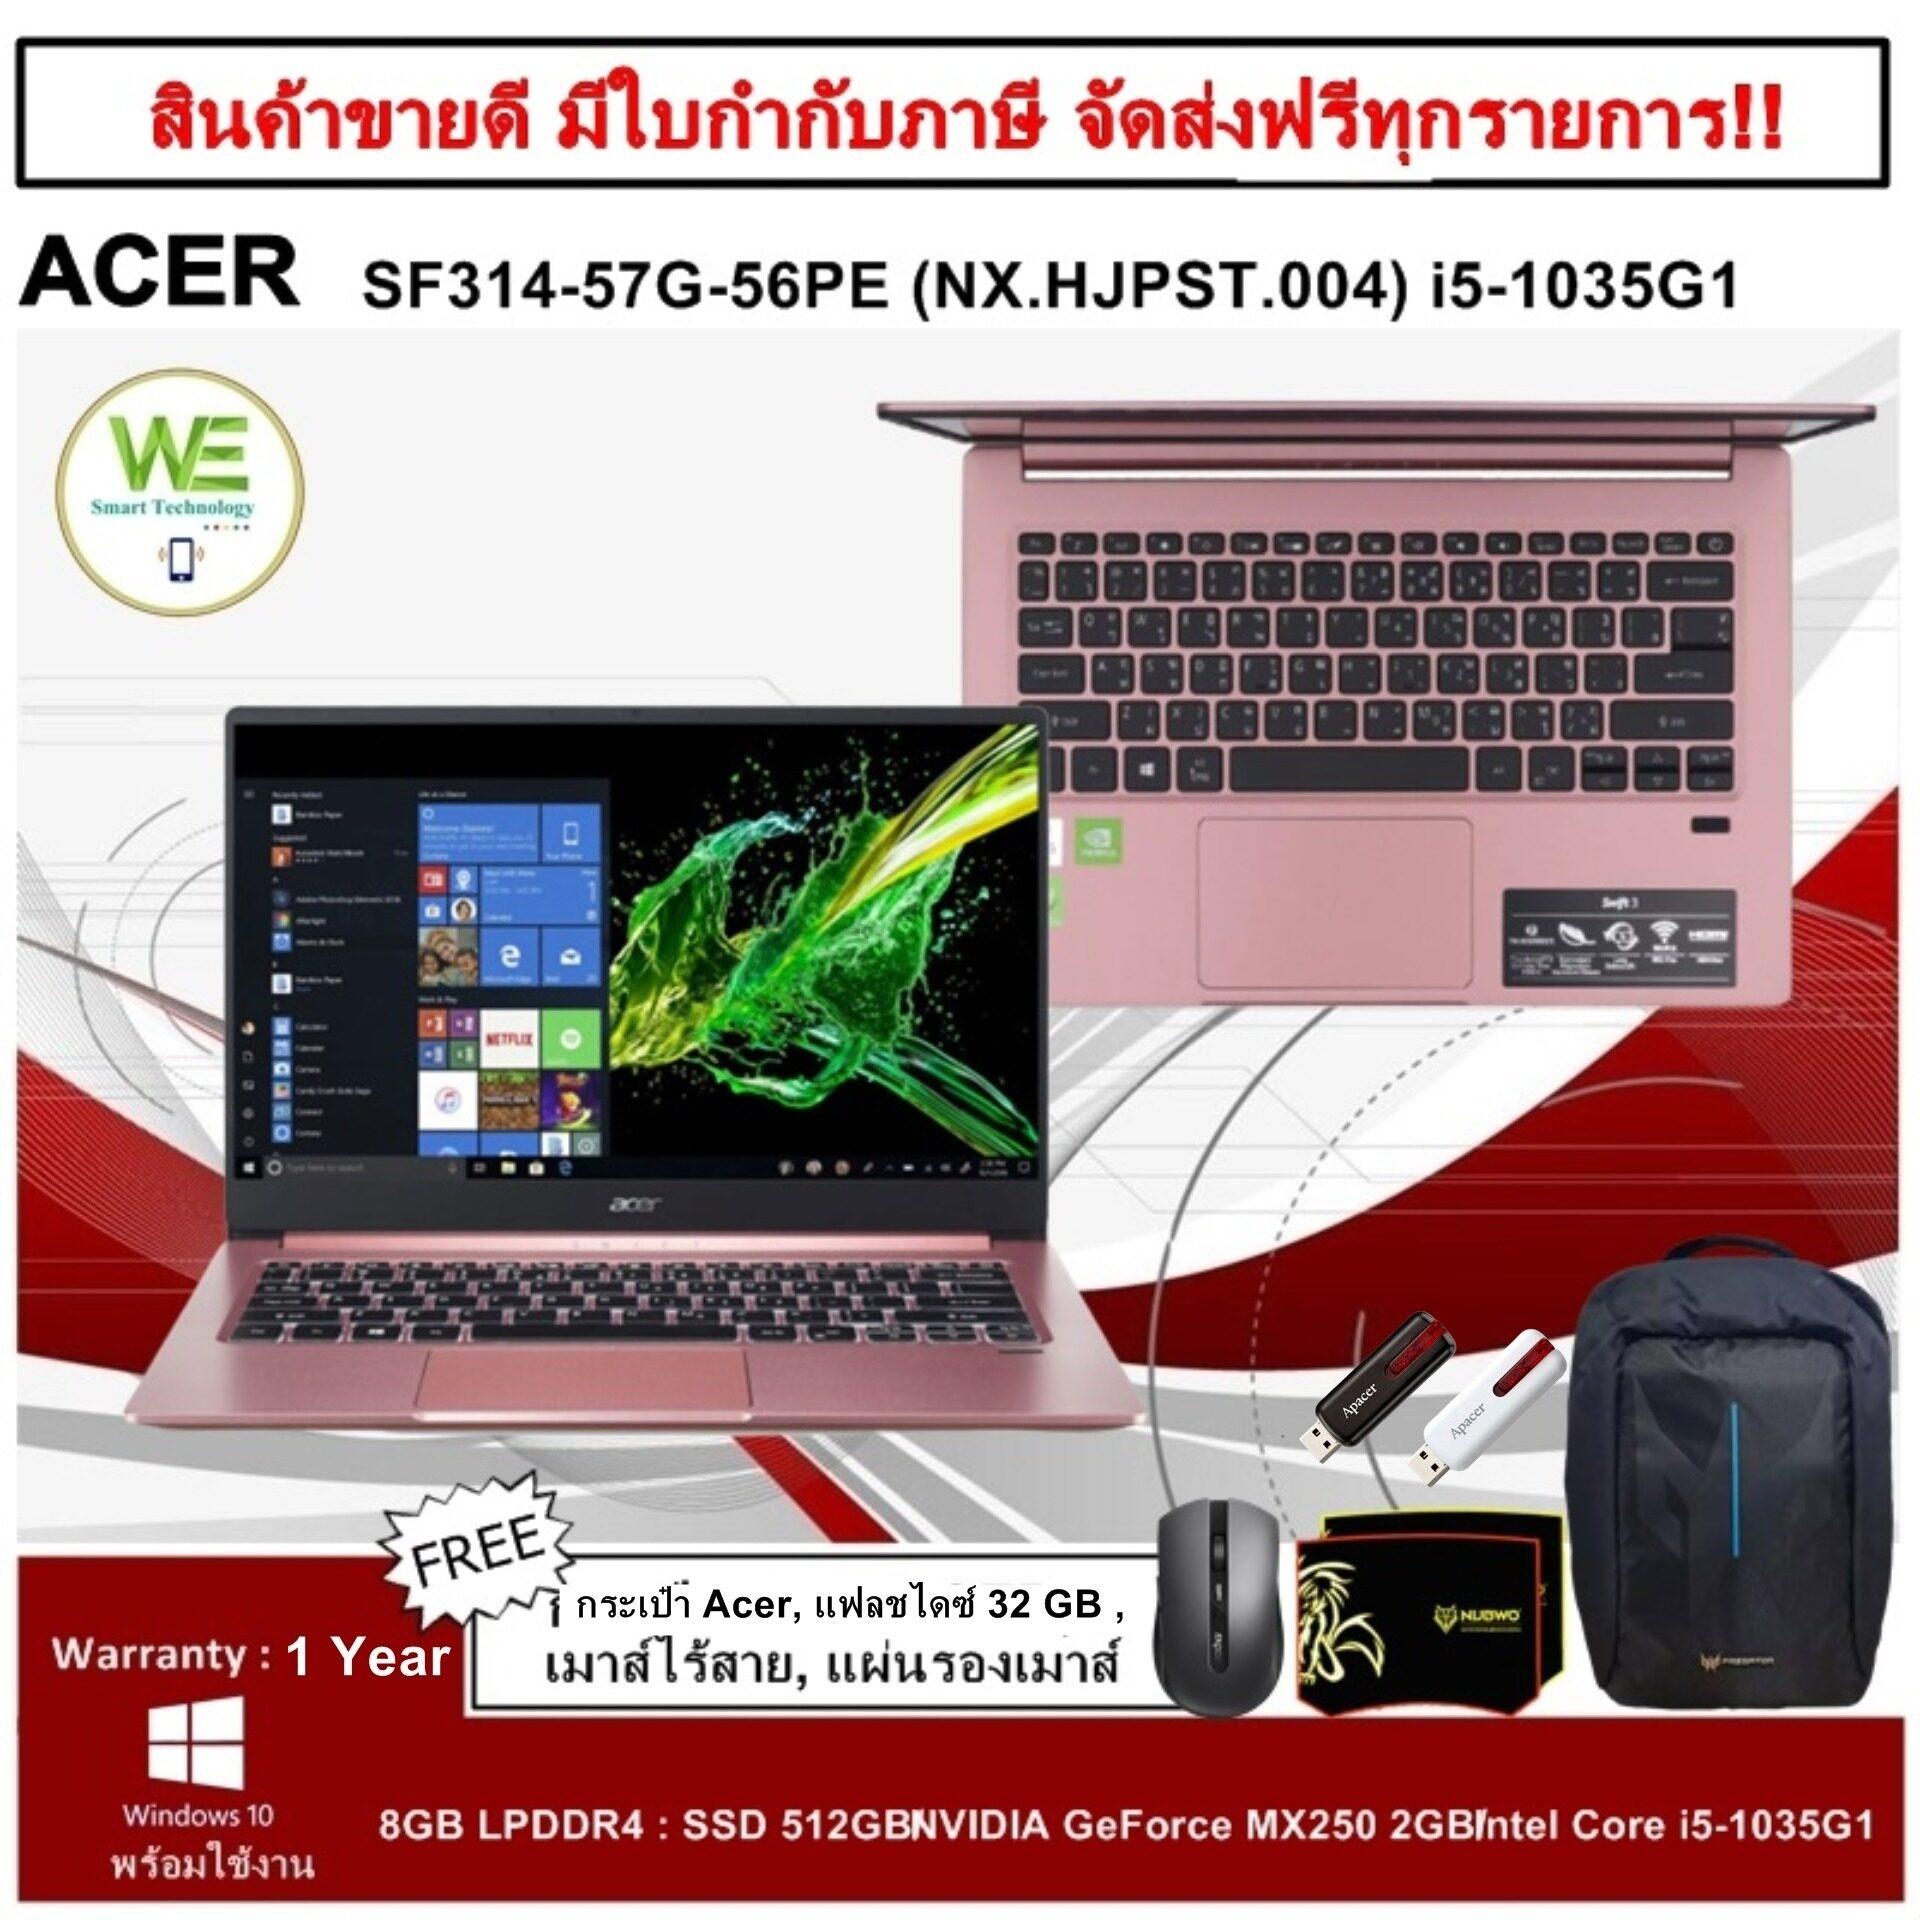 Acer Notebook (โน๊ตบุ๊ค)sf314-57g-56pe (nx.hjpst.004) I5-1035g1/8gb/512gb Ssd/geforce Mx250 2gb/14 Fhd/win10home/millennial Pink/0%.